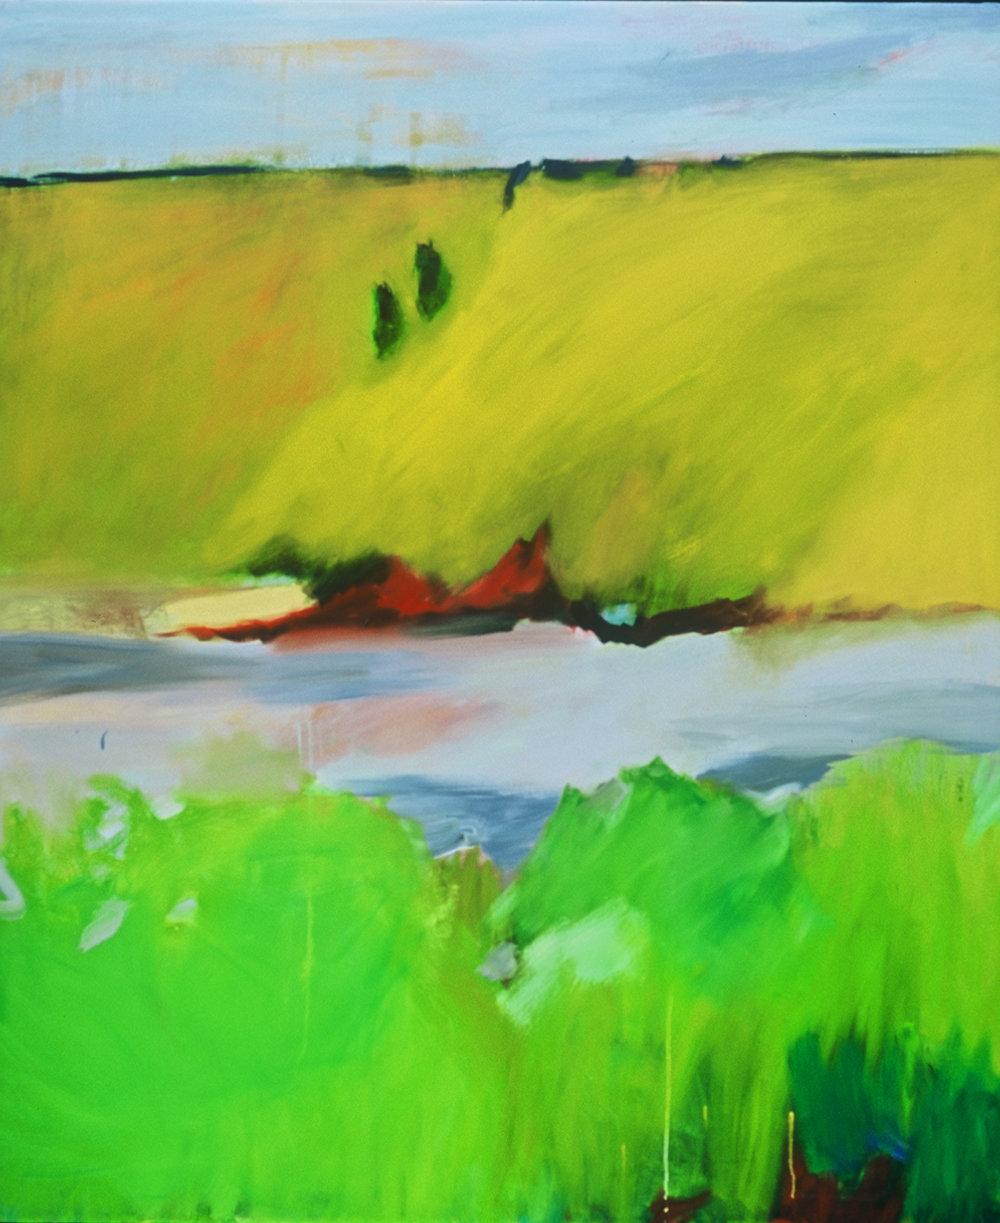 River, acrylic on canvas